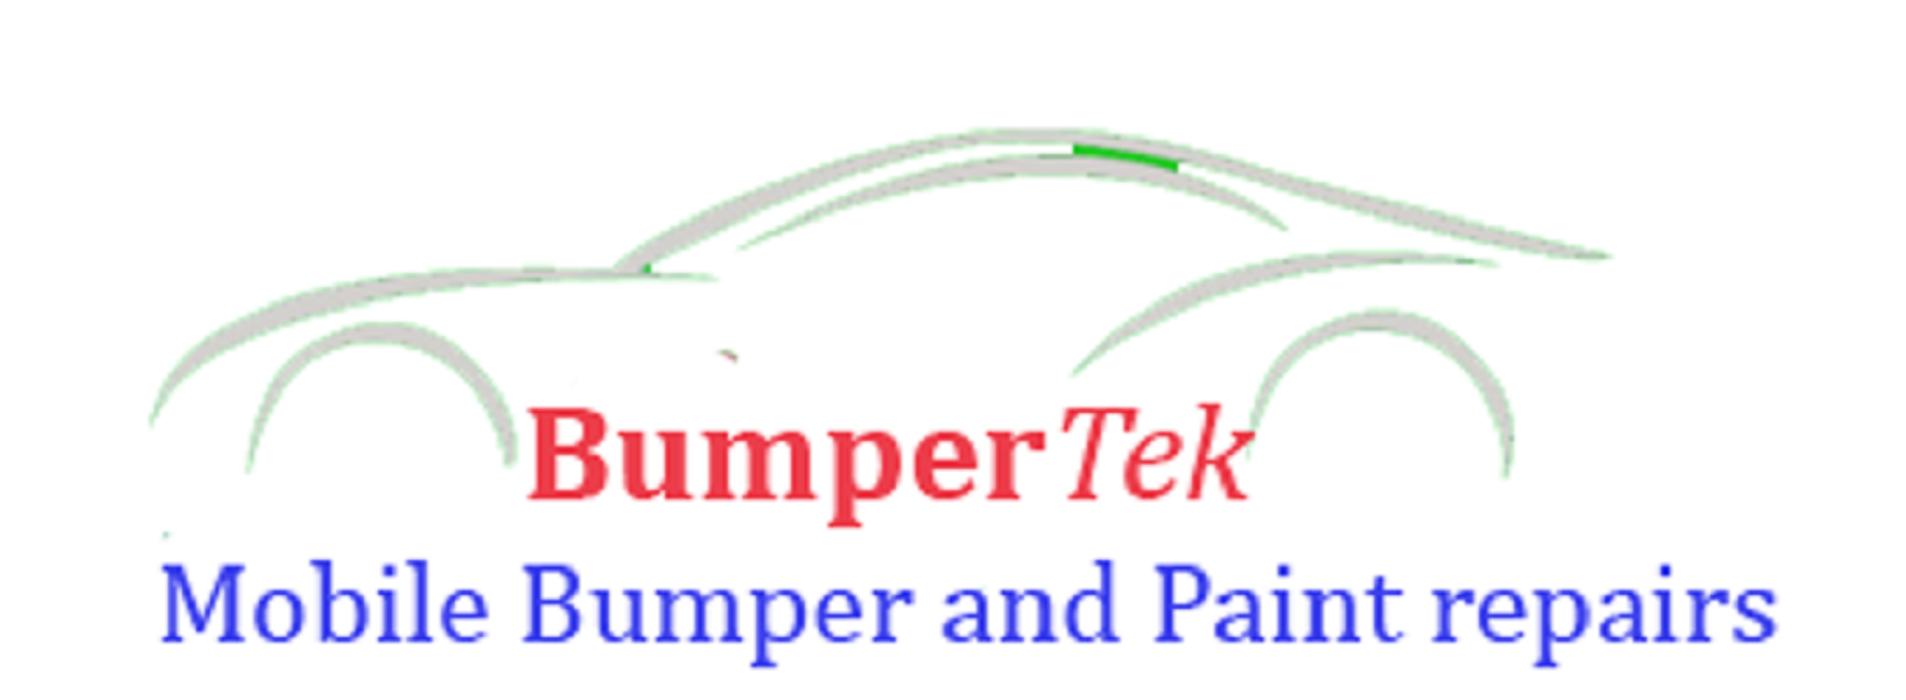 Bumpertek Carpaint Repair